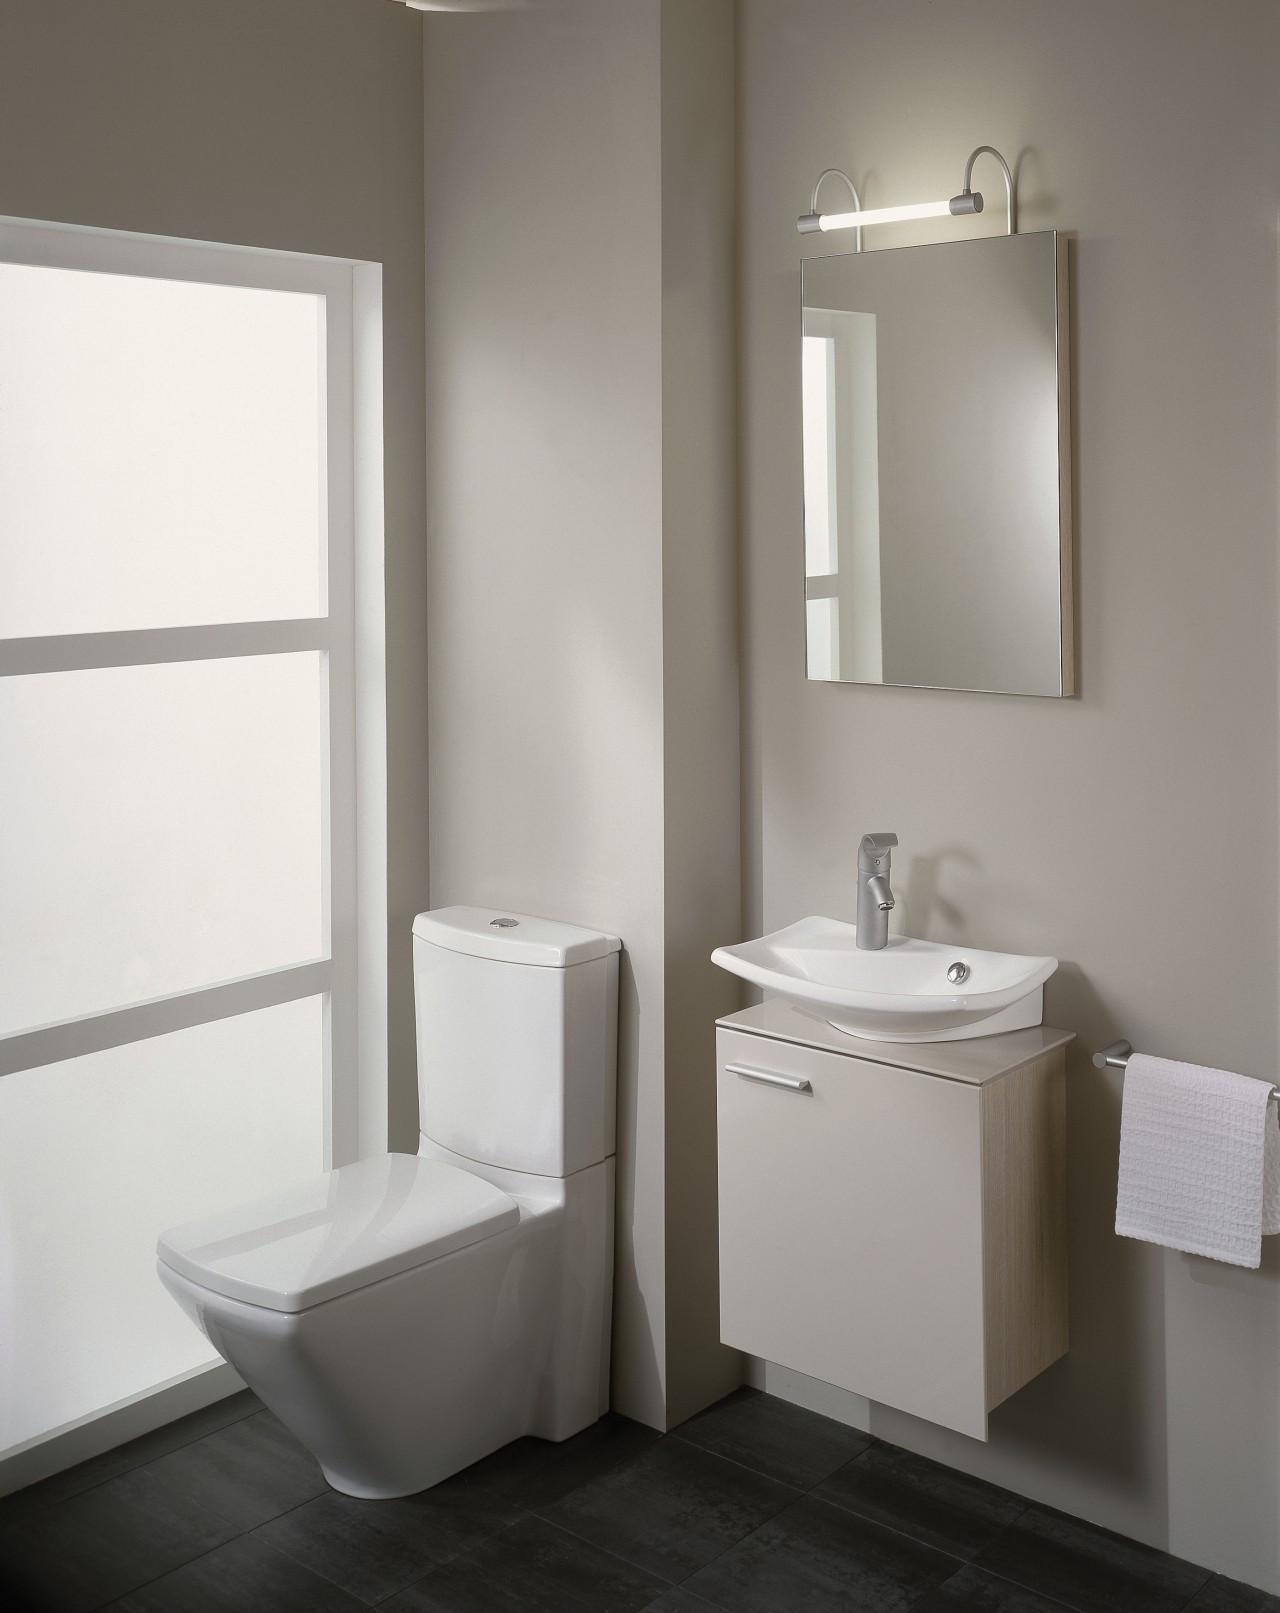 View of this modern bathroom bathroom, bathroom accessory, bathroom cabinet, bathroom sink, bidet, ceramic, floor, interior design, plumbing fixture, product design, room, sink, tap, toilet, toilet seat, gray, white